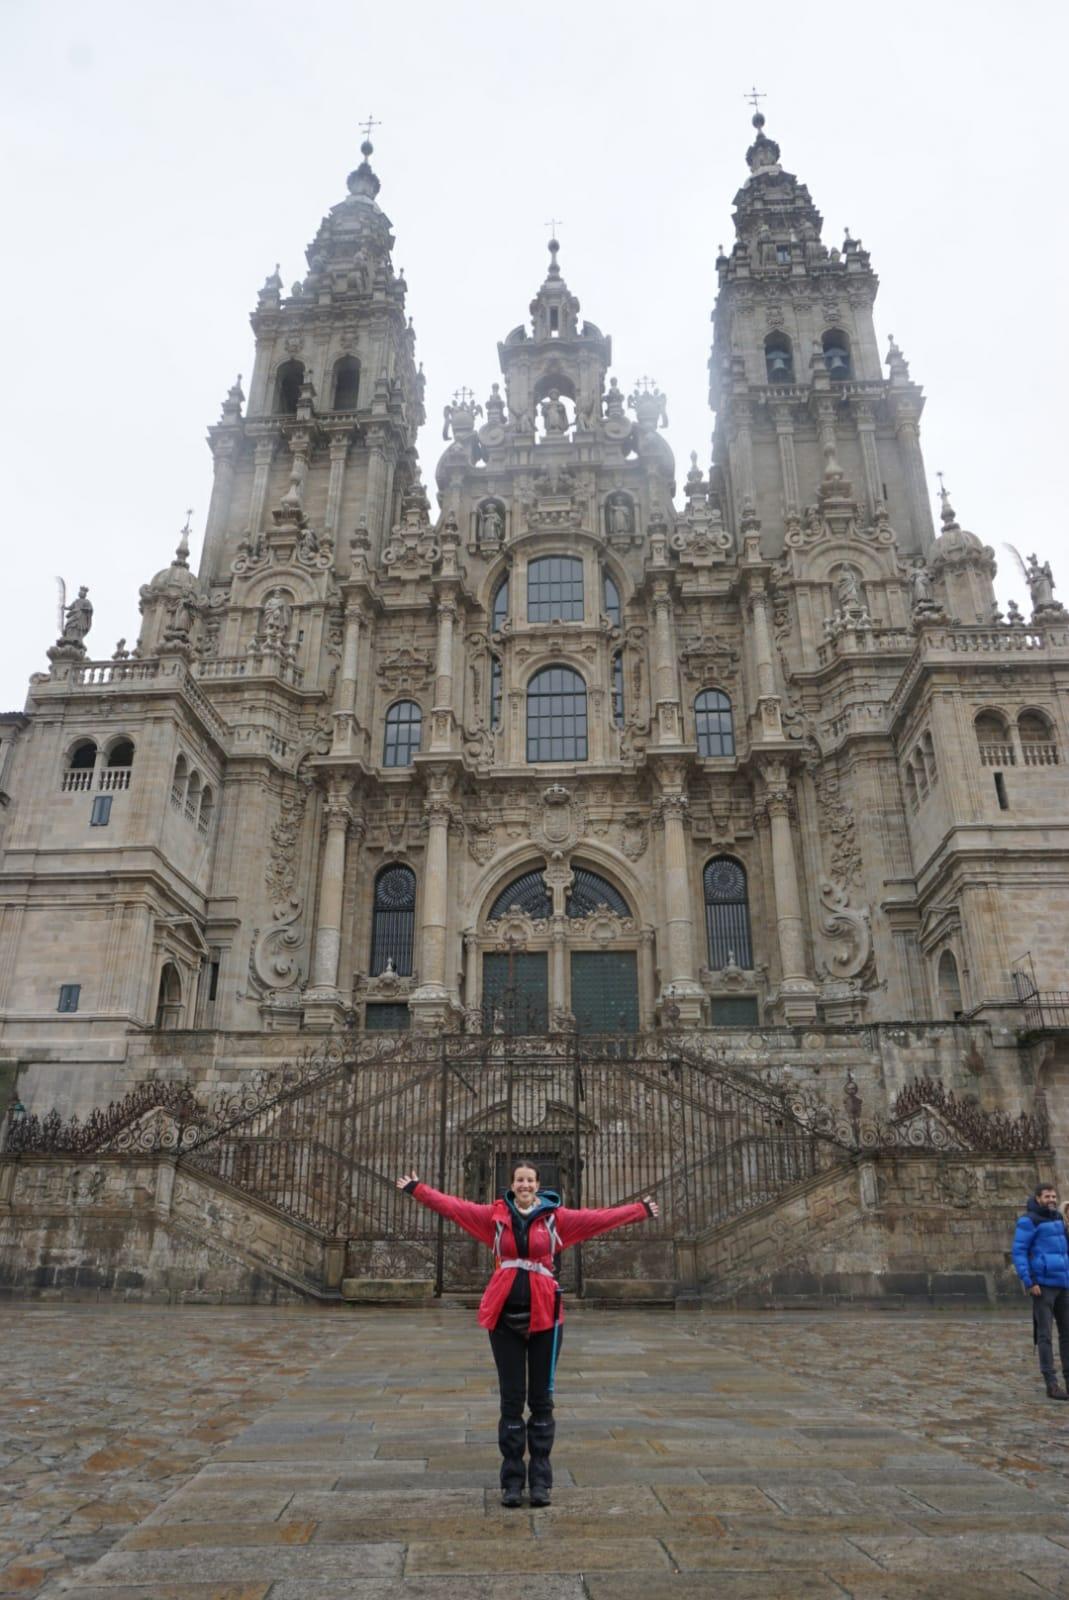 Catedral De Santiago de Compostela, Camino de Santiago, Galicia